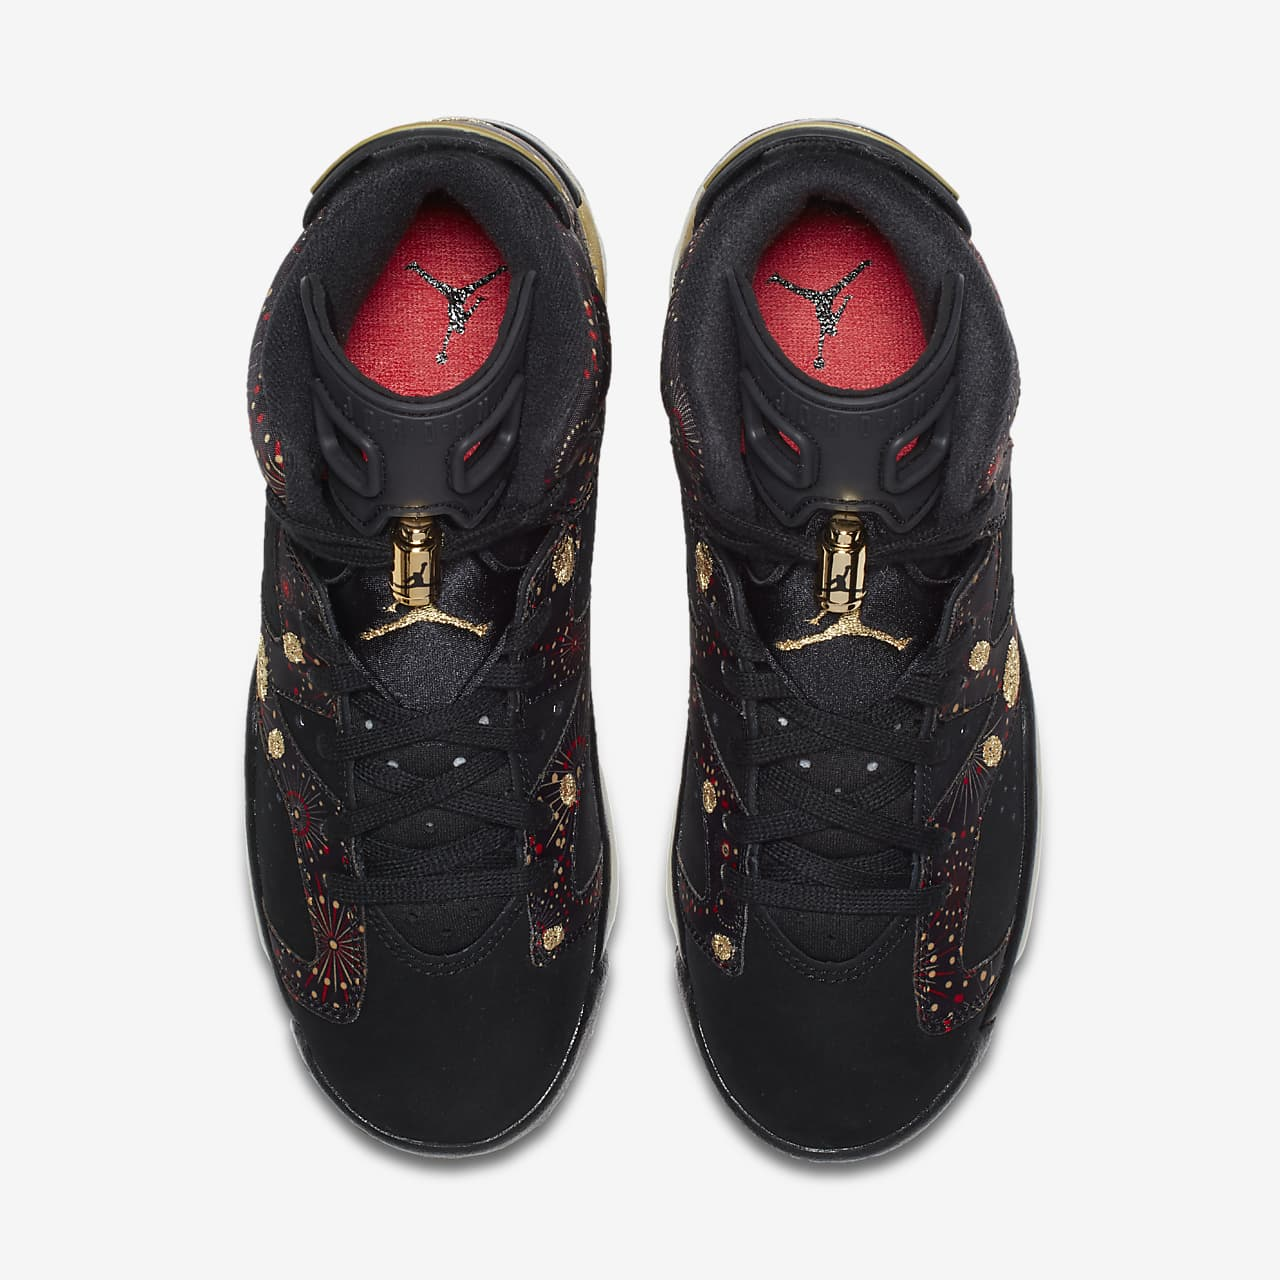 vacío estropeado Produce  Air Jordan 6 Retro CNY Older Kids' Shoe. Nike PH